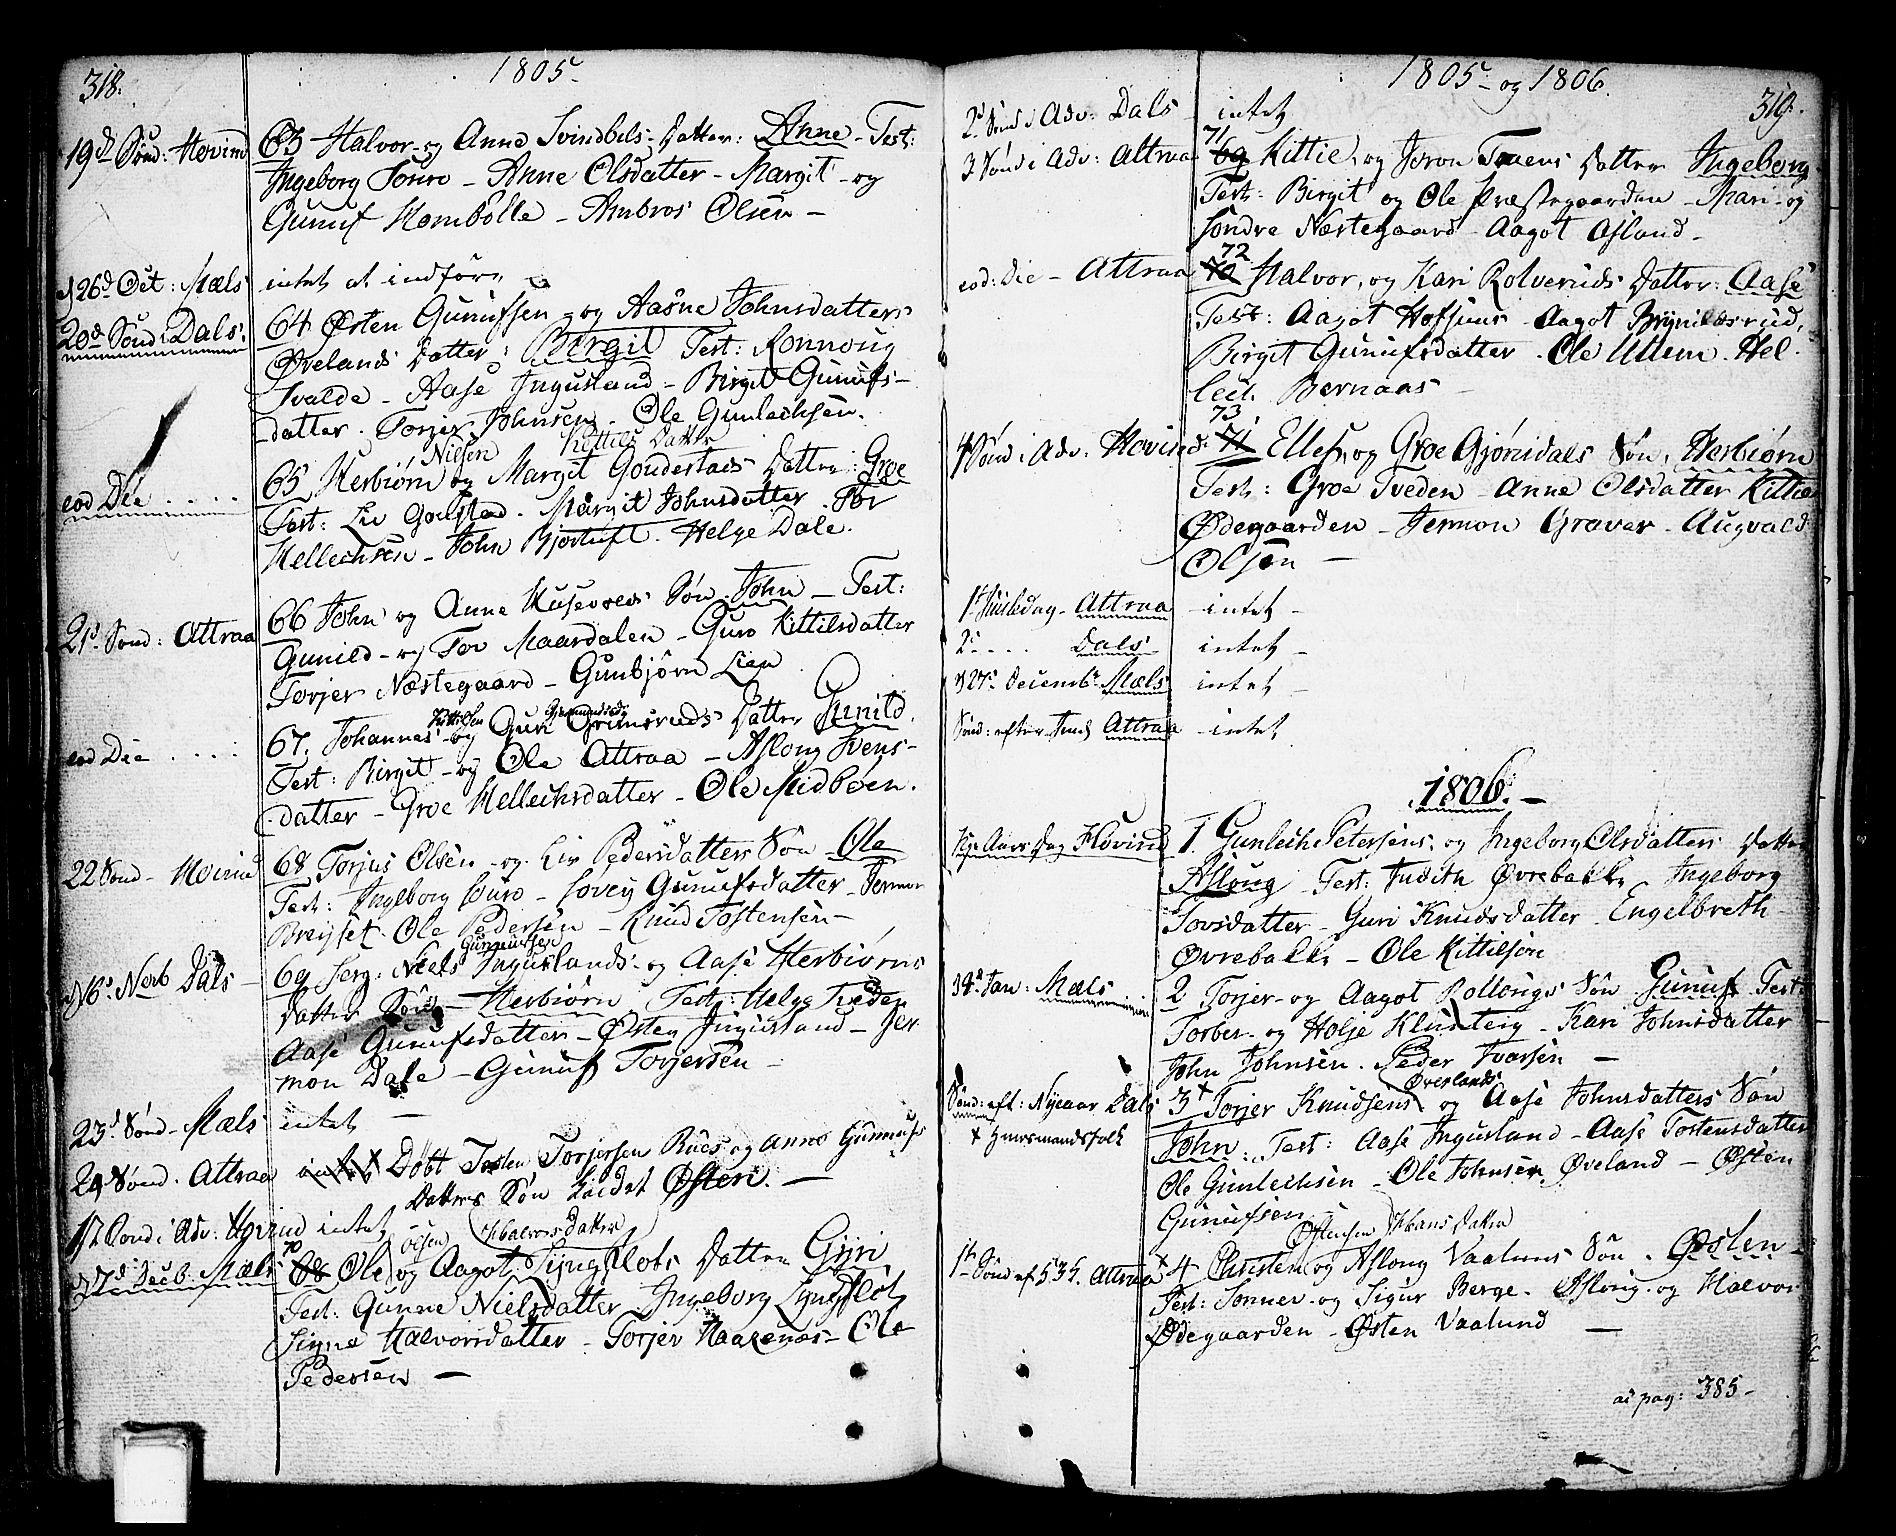 SAKO, Tinn kirkebøker, F/Fa/L0002: Ministerialbok nr. I 2, 1757-1810, s. 318-319